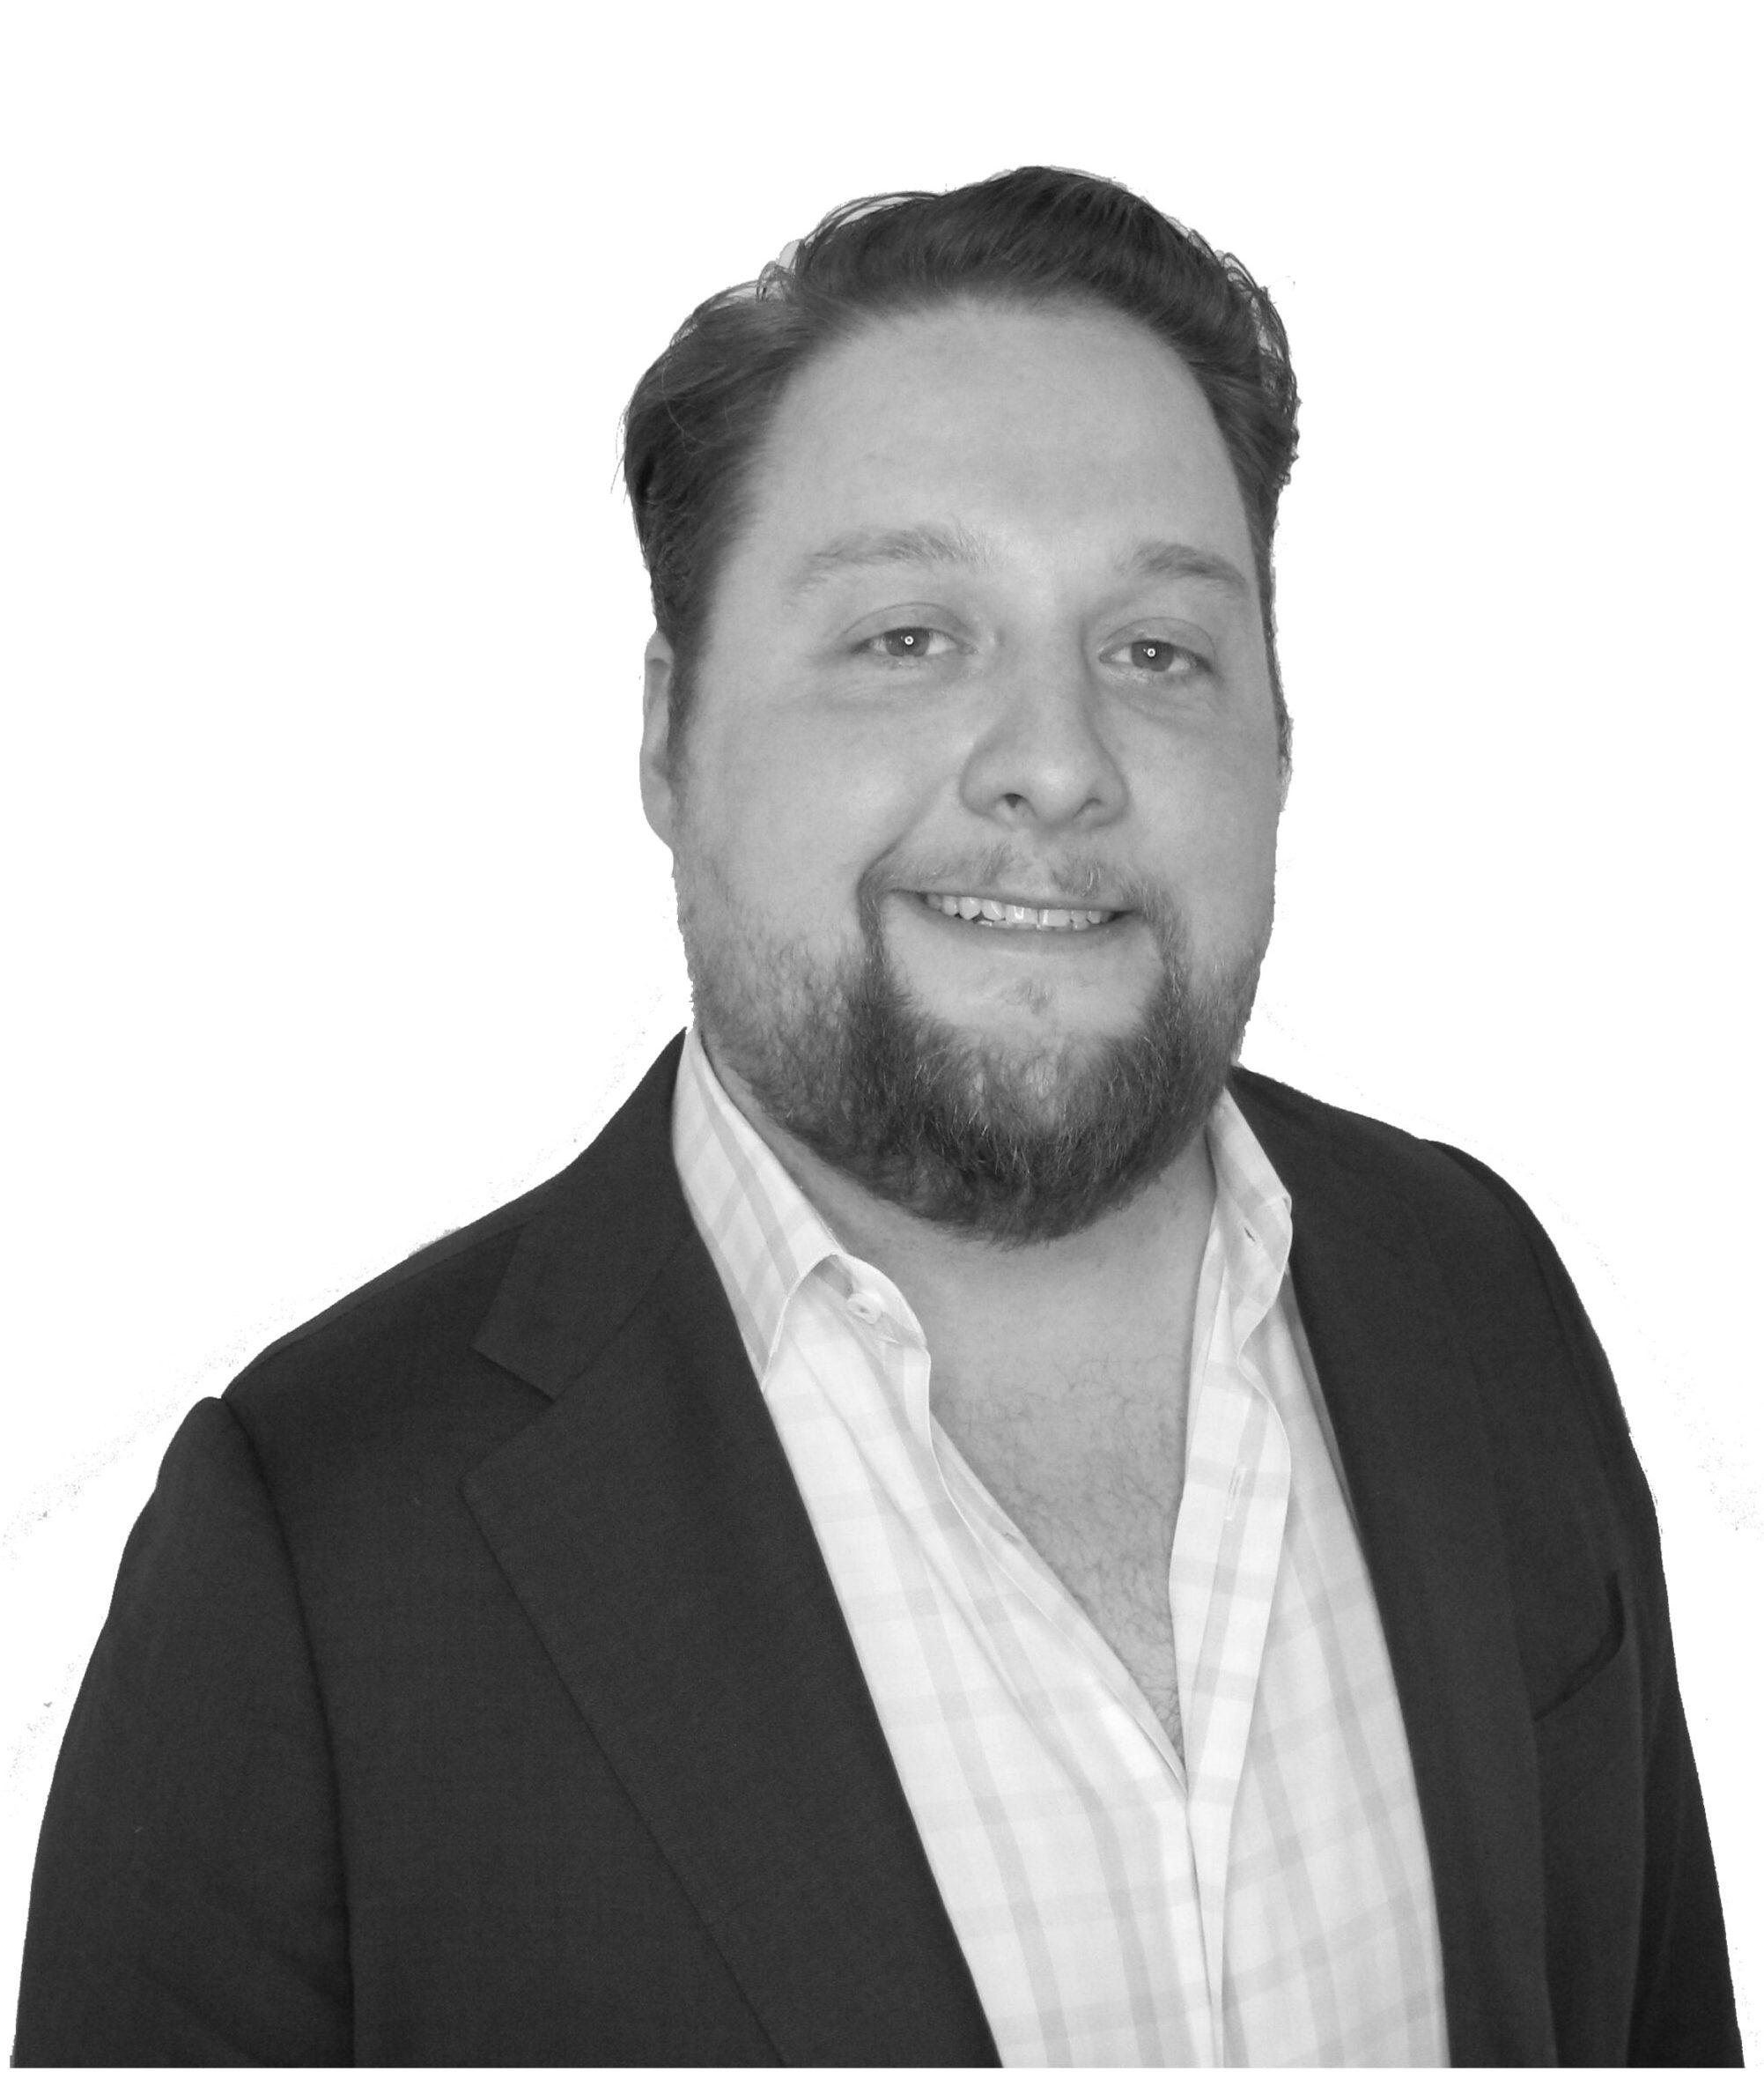 https://argonautadvisors.com/wp-content/uploads/2020/07/Eric-scaled-e1598340788527.jpg